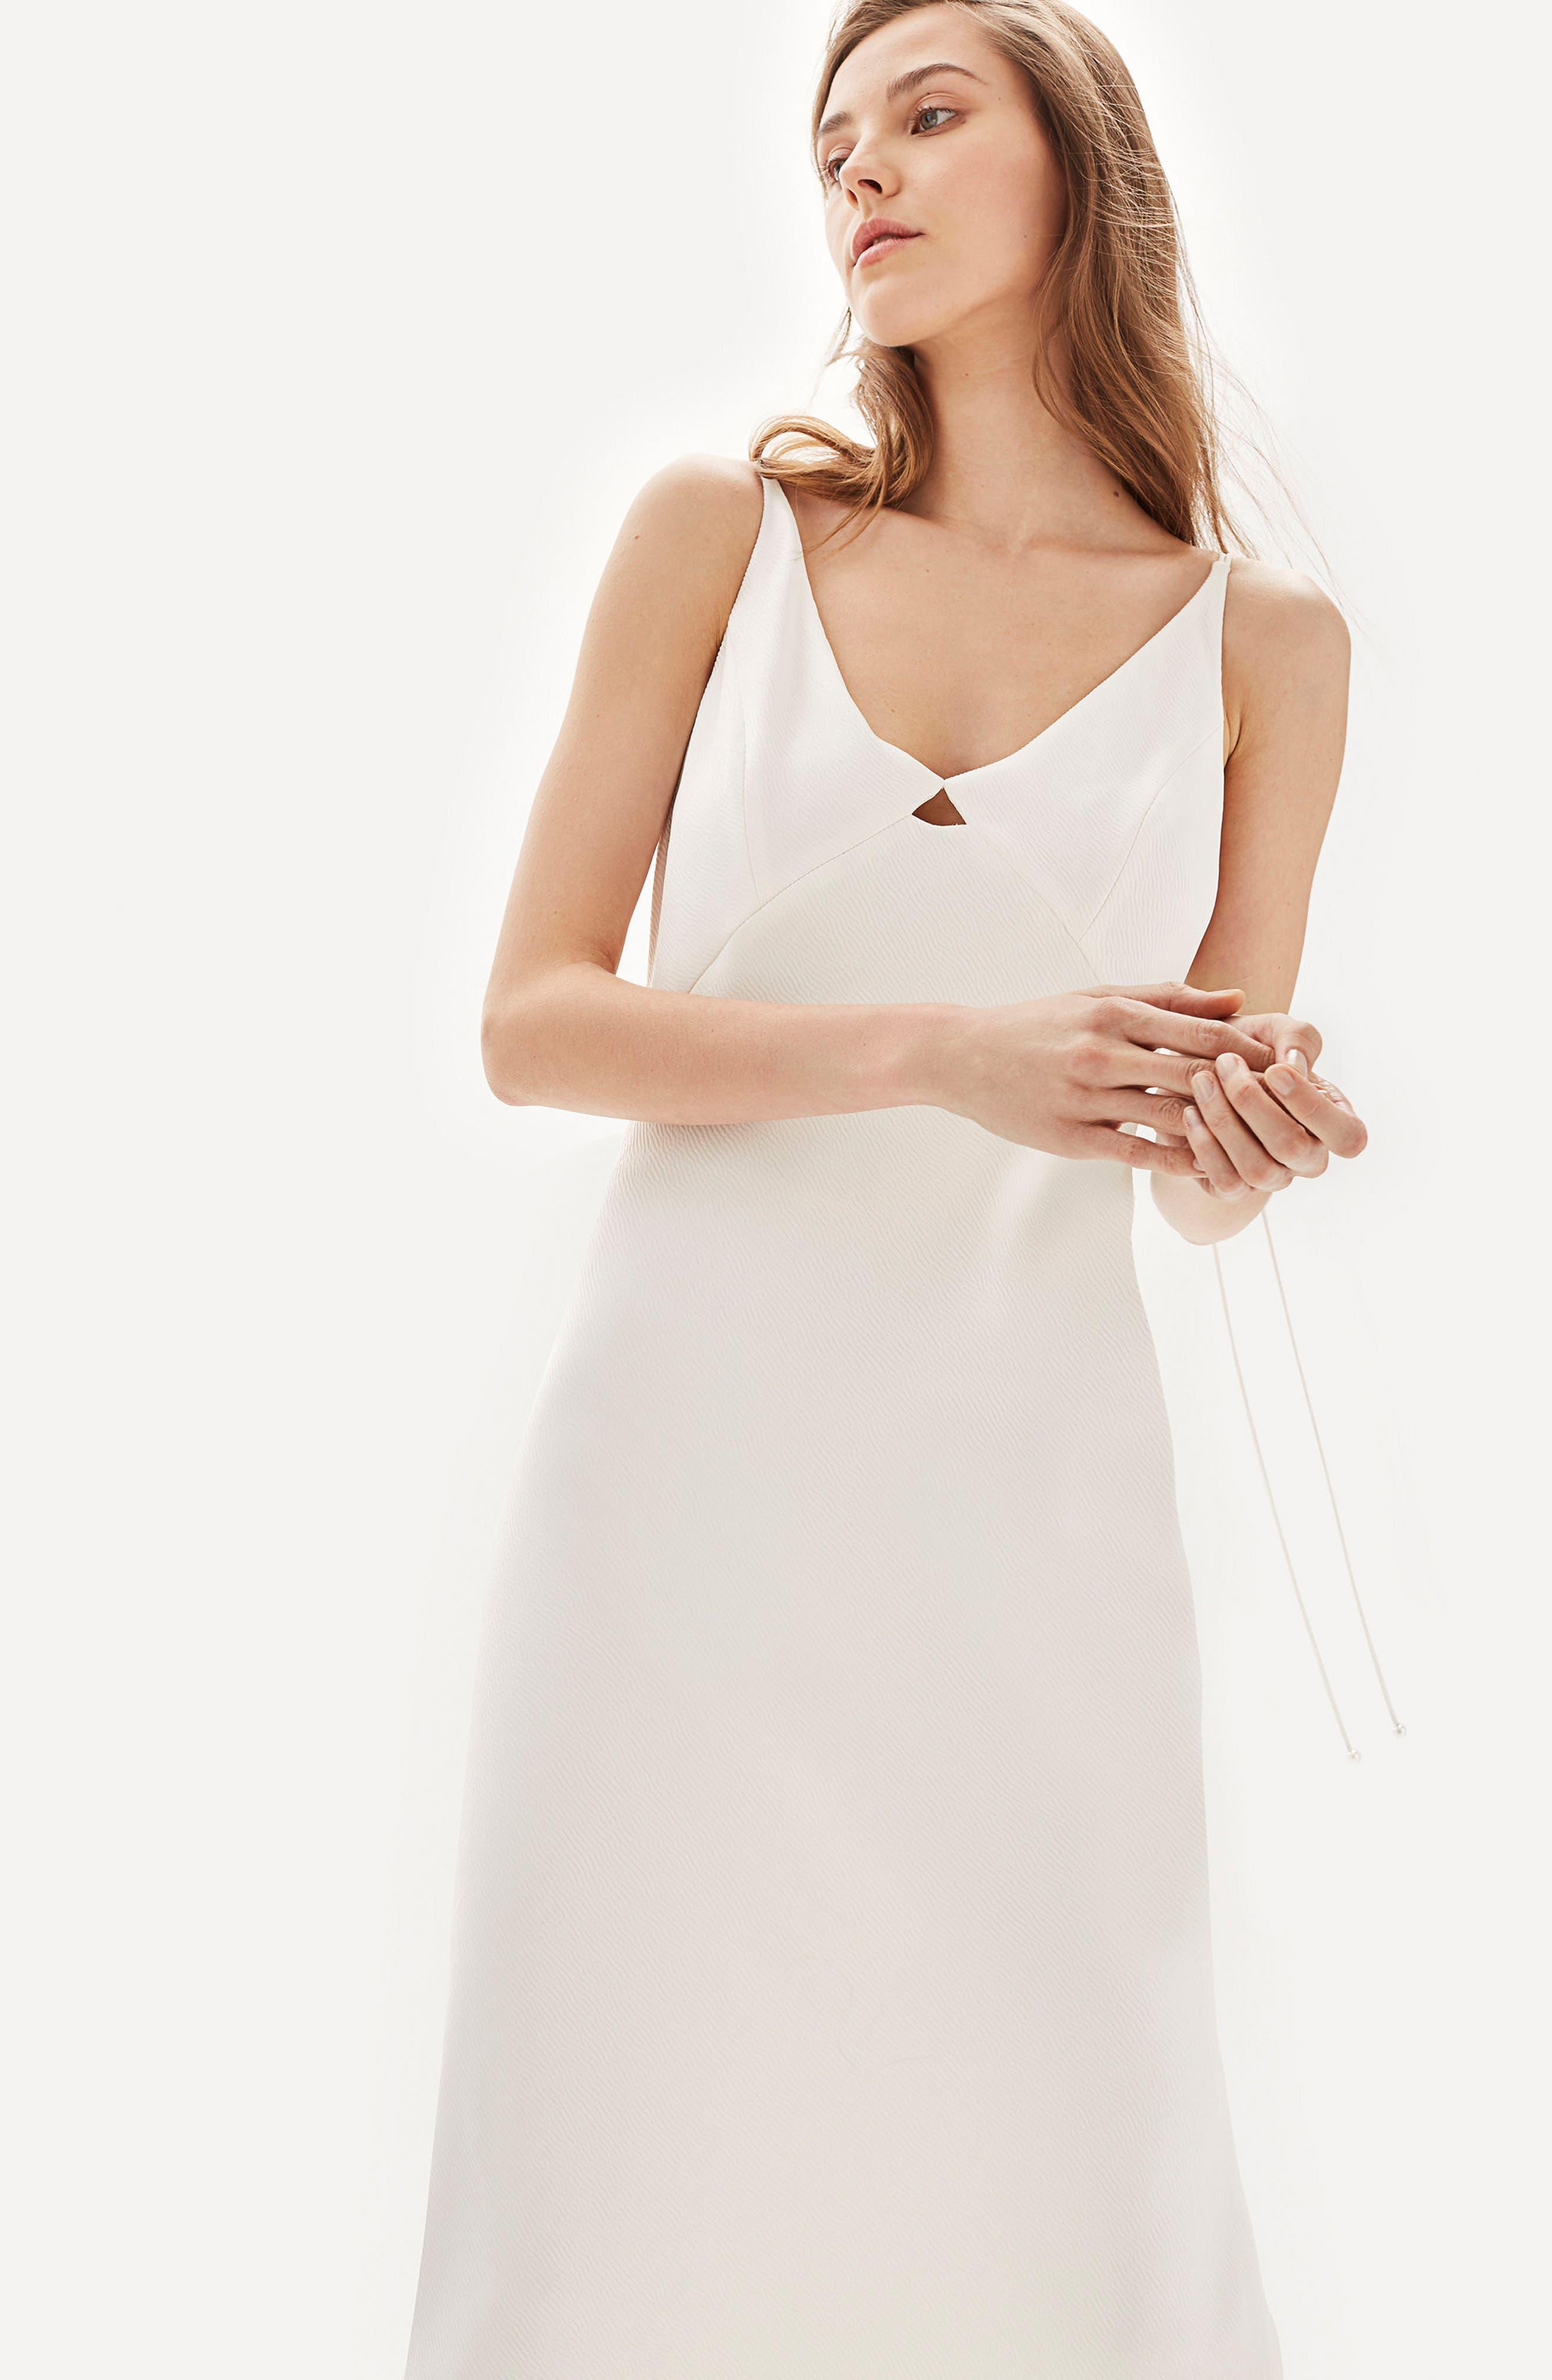 Bride V-Neck Satin Sheath Gown,                             Alternate thumbnail 6, color,                             900